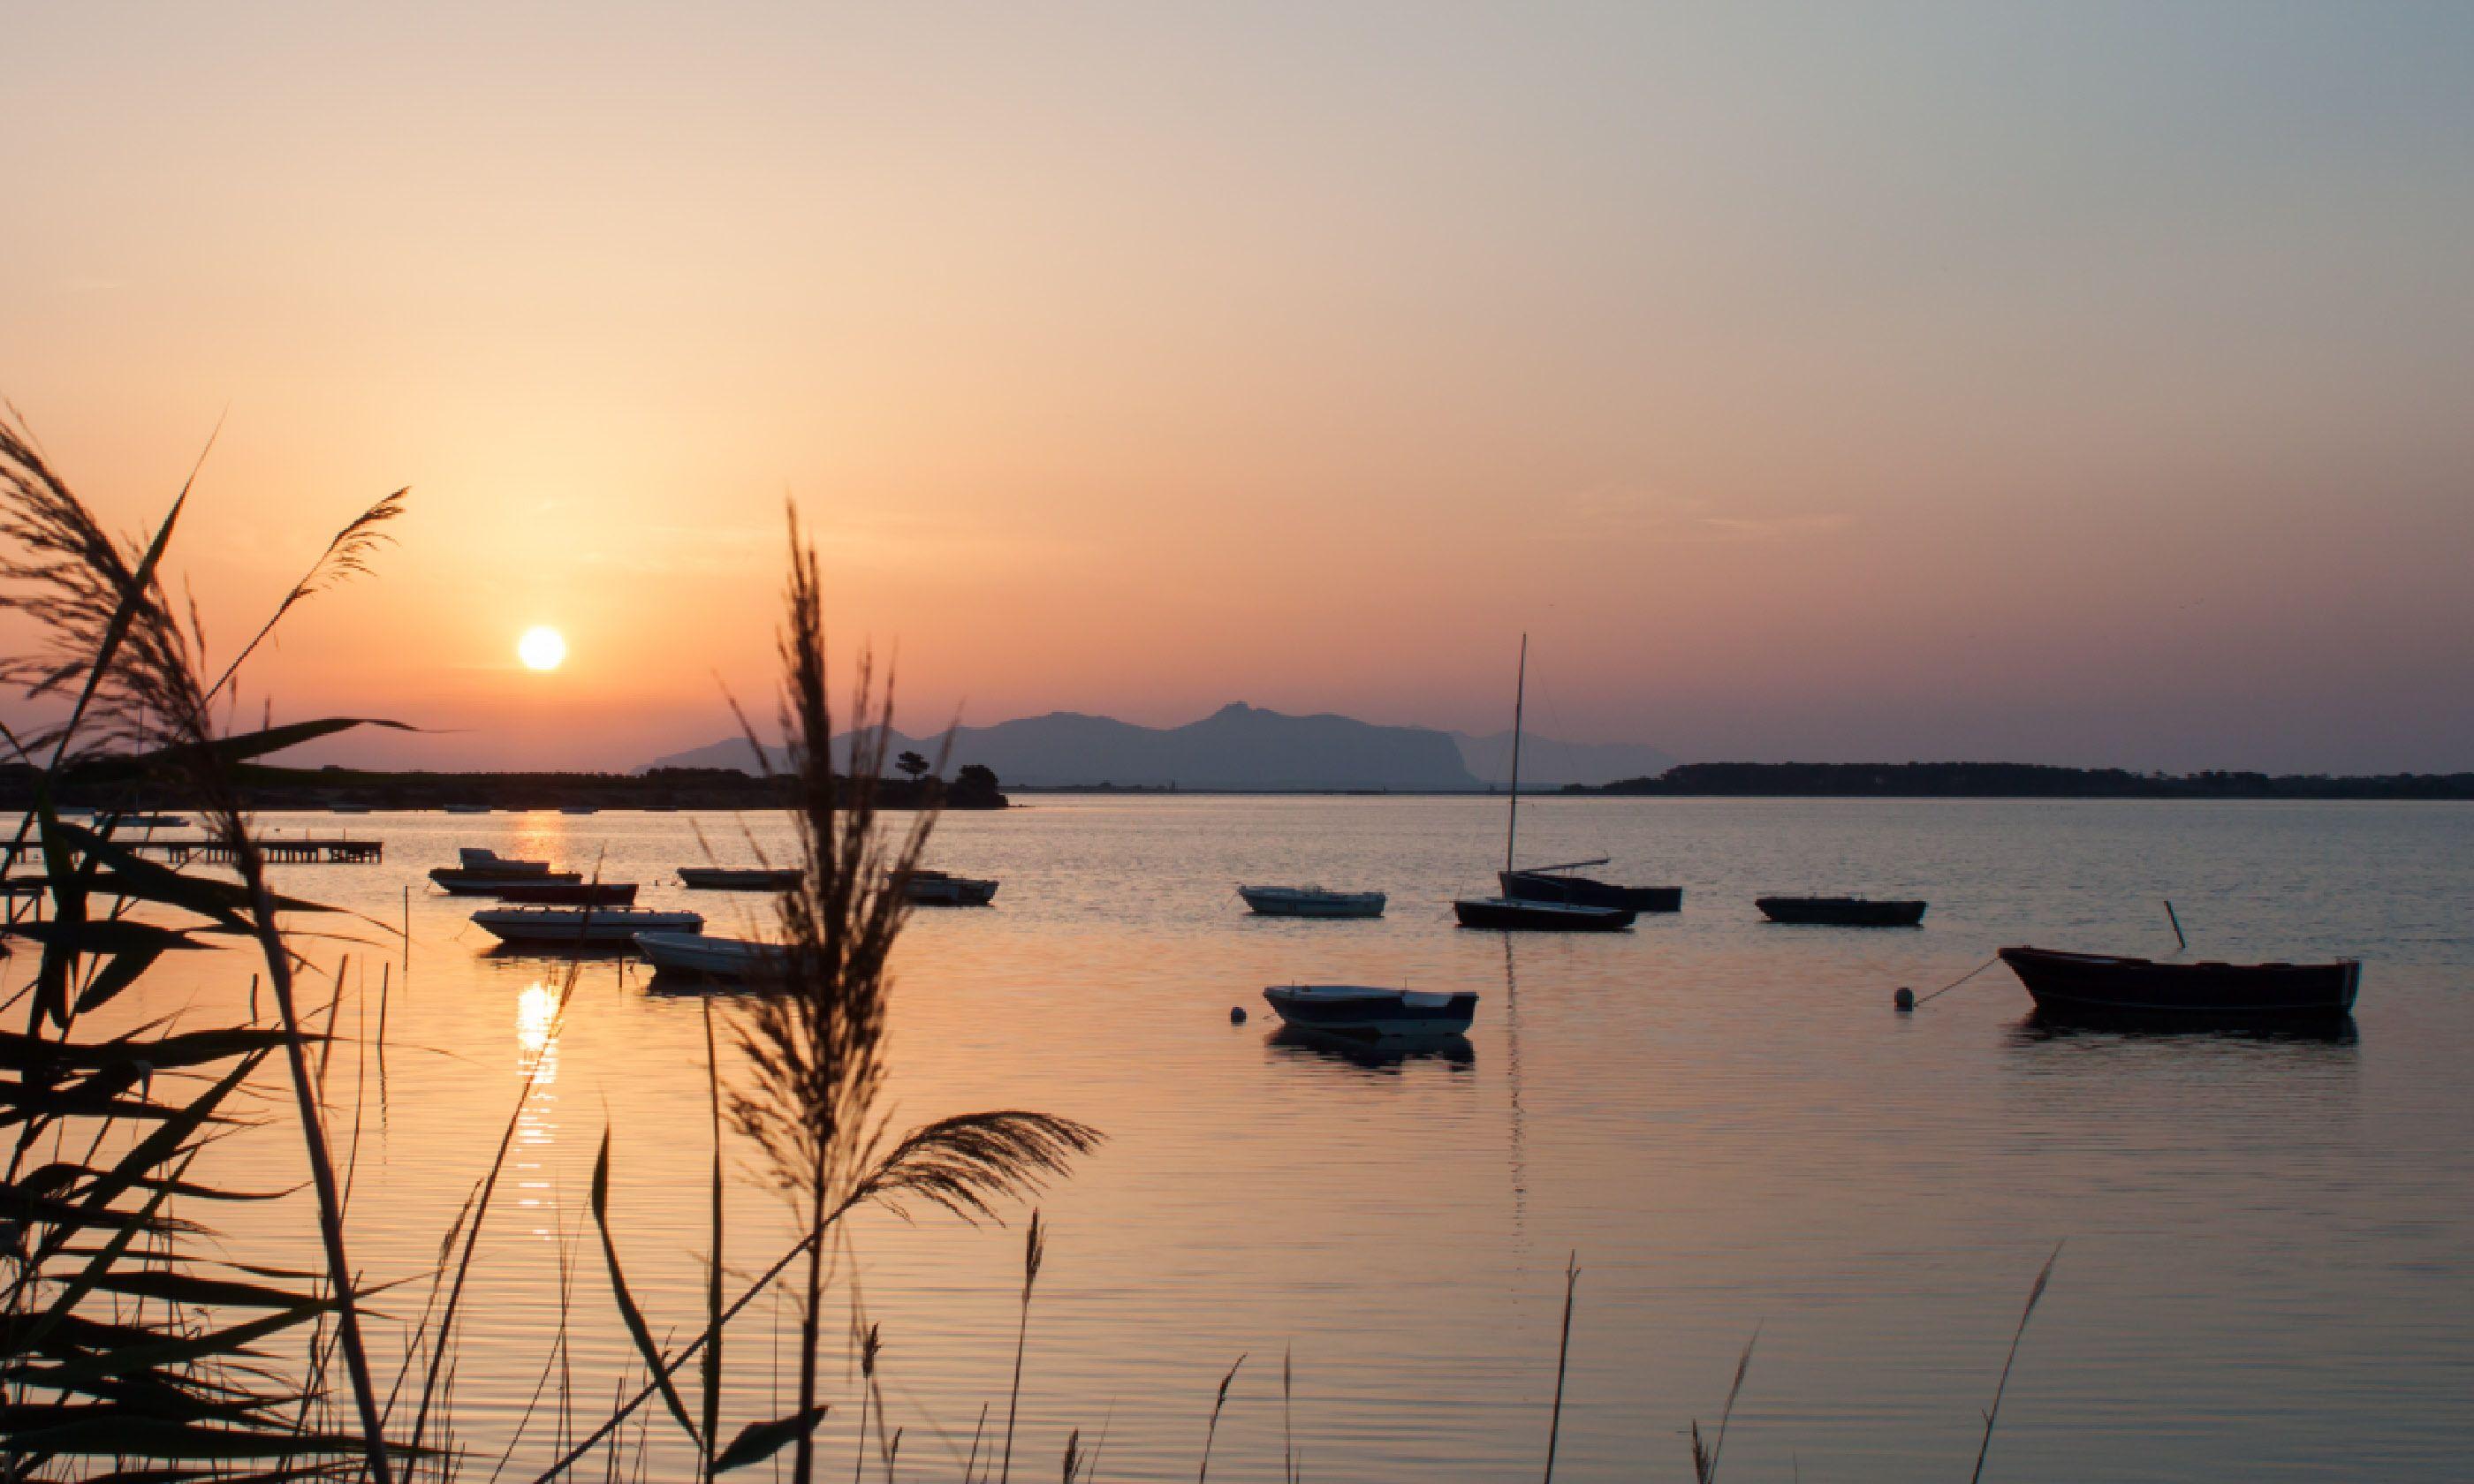 Sunset at Mozia, Sicily (Shutterstock)